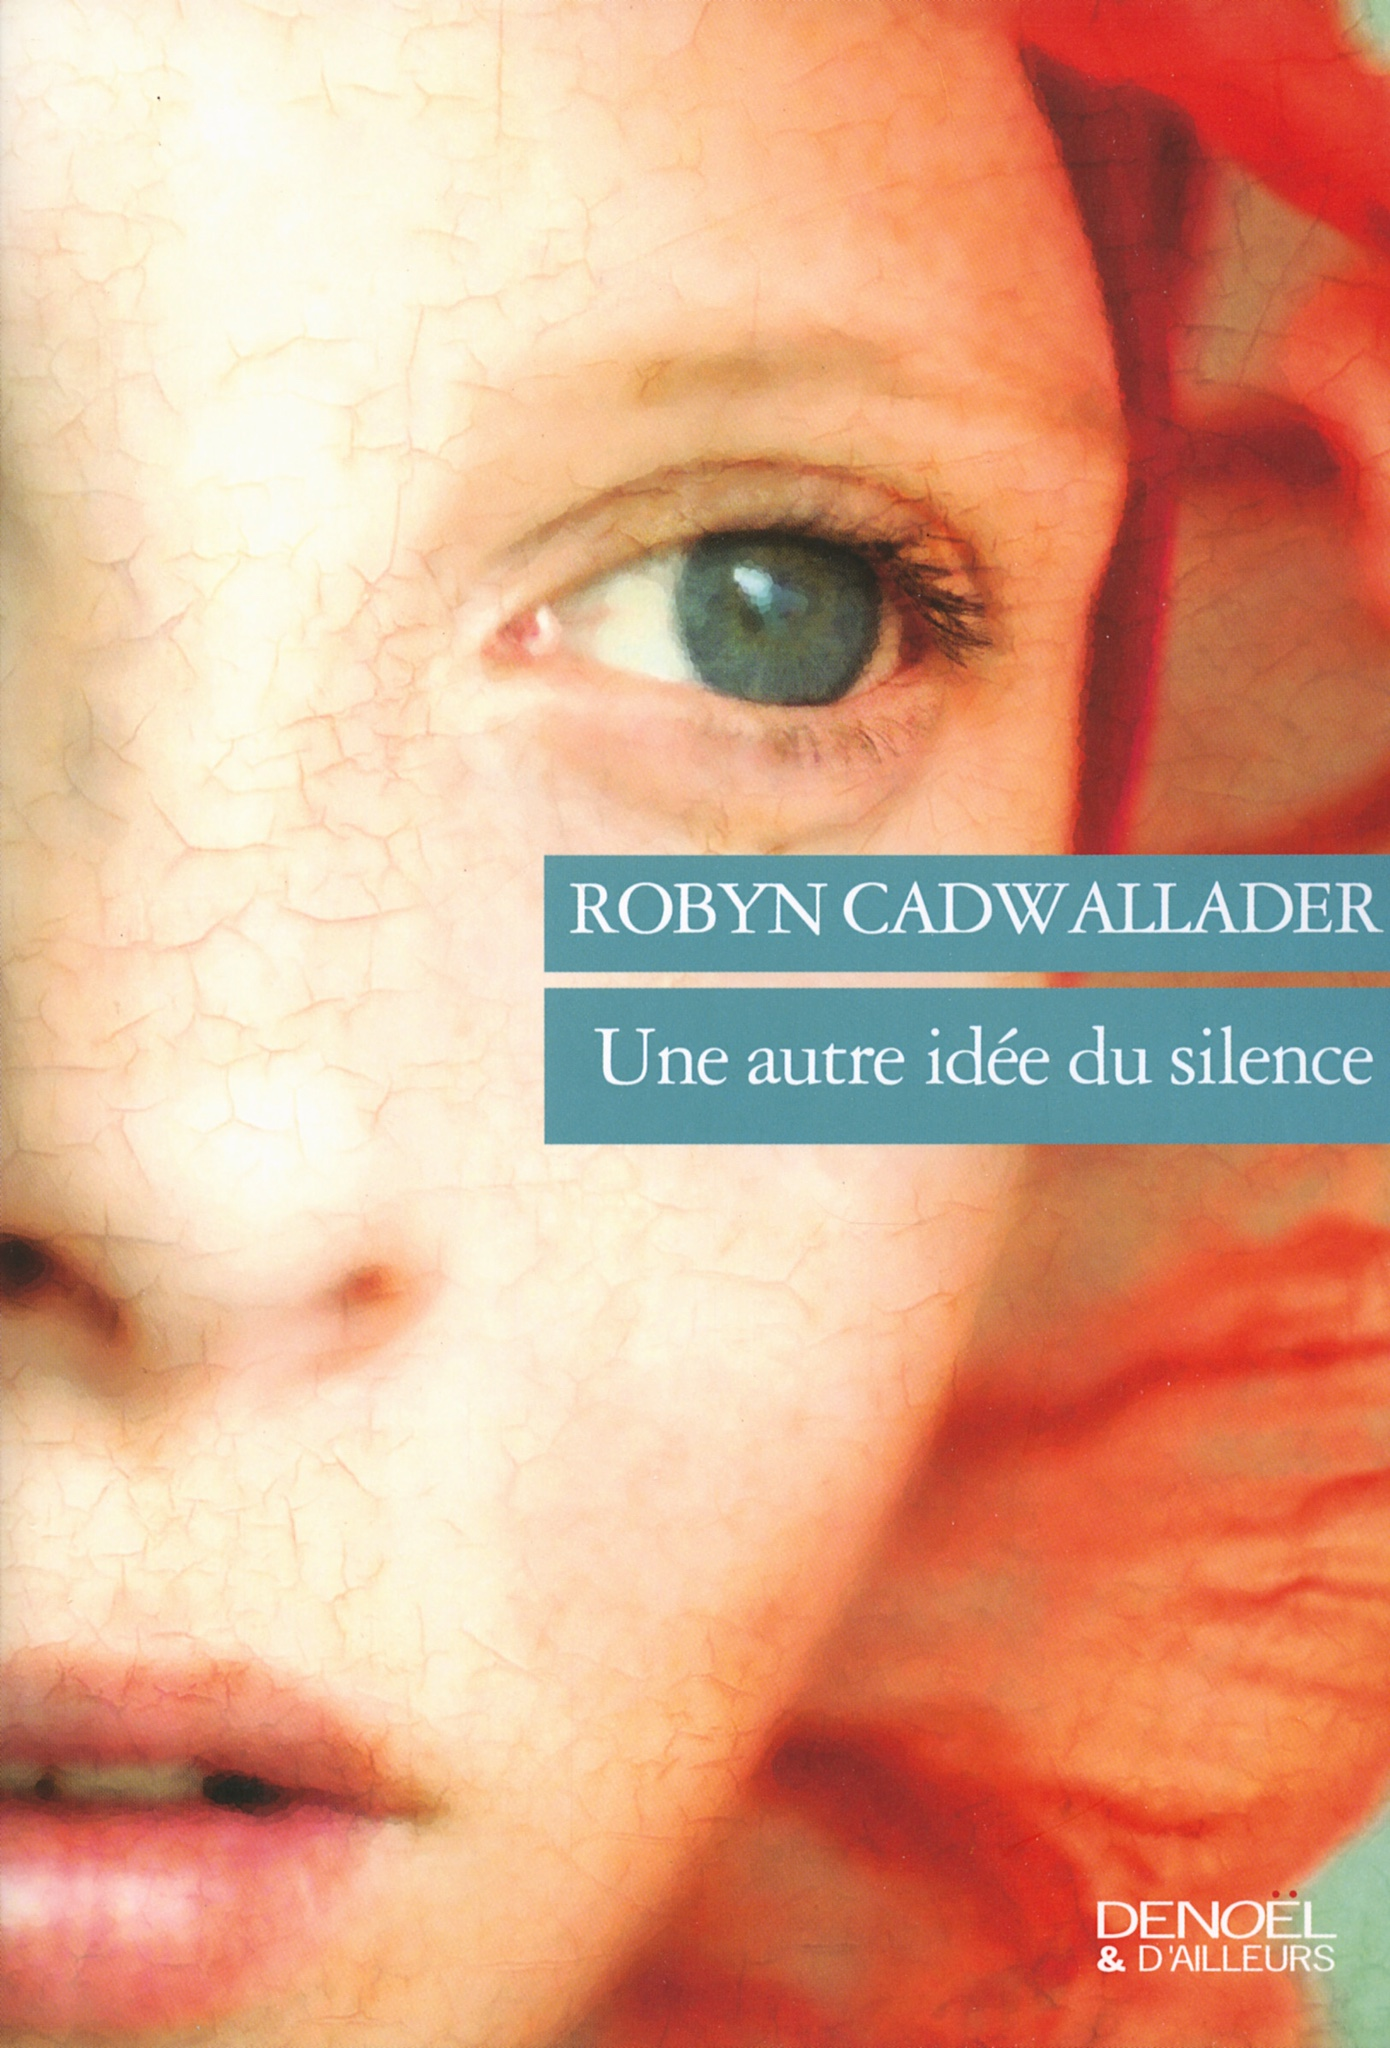 Robyn Cadwallader : Une autre idée du silence